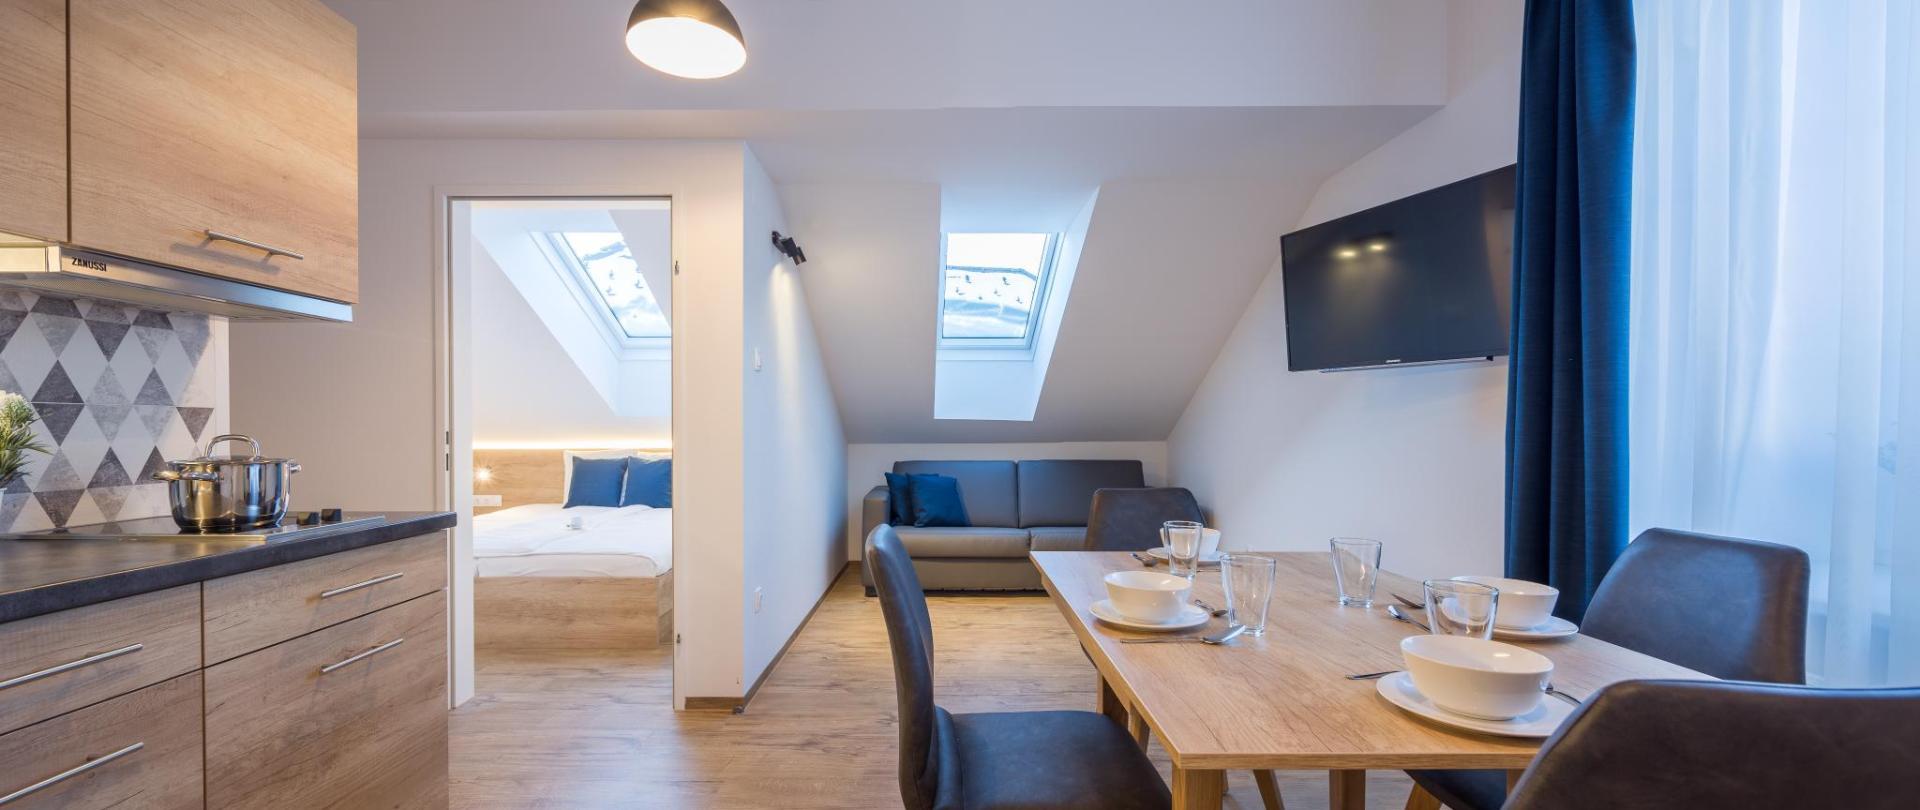 EdelMur Apartmenthaus